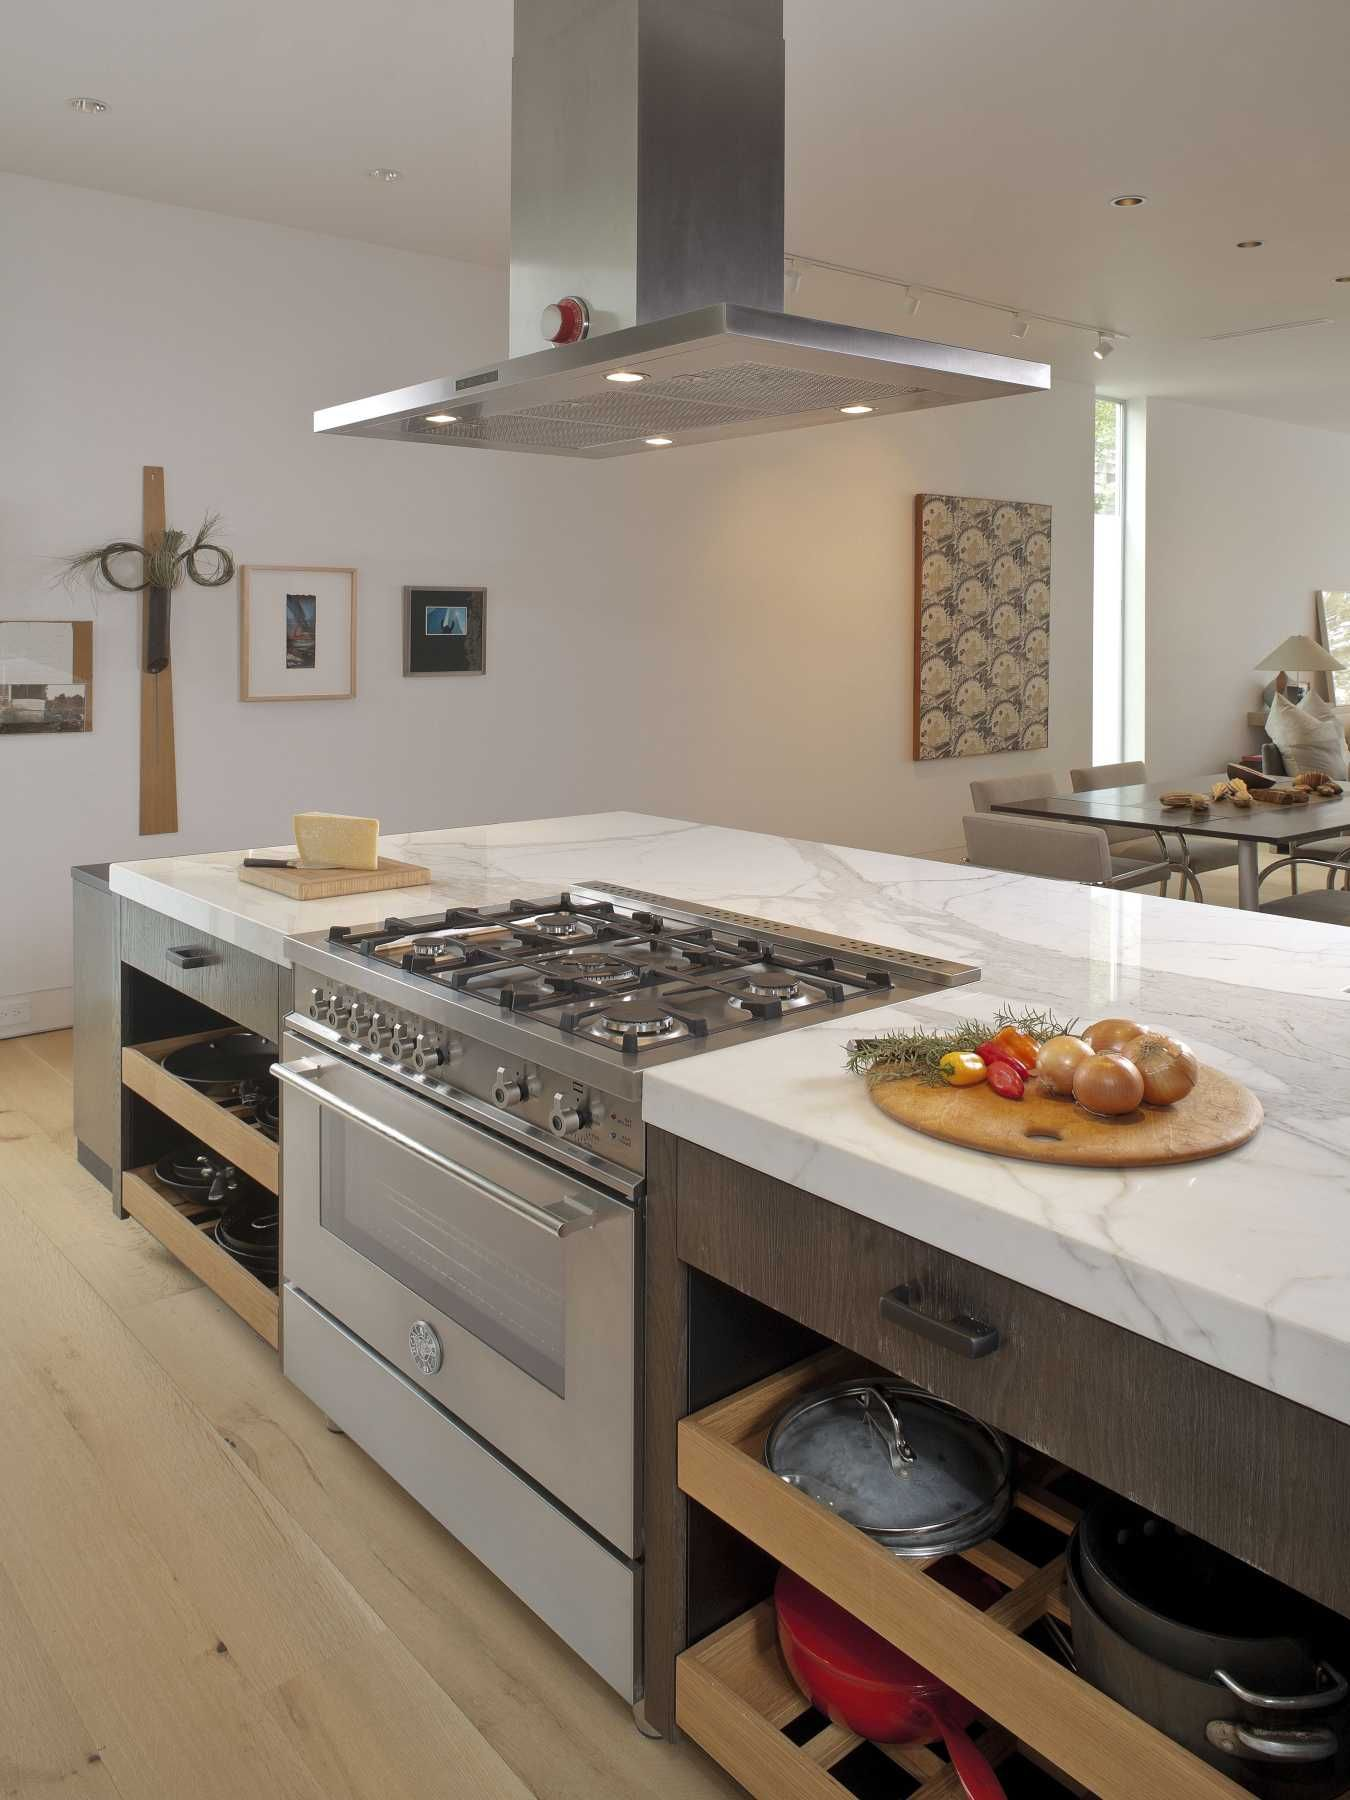 Houston Tx Bertazzoni 36 5 Burner Professional Series All Gas Kitchen Island With Stove Kitchen Island With Cooktop Kitchen Layouts With Island